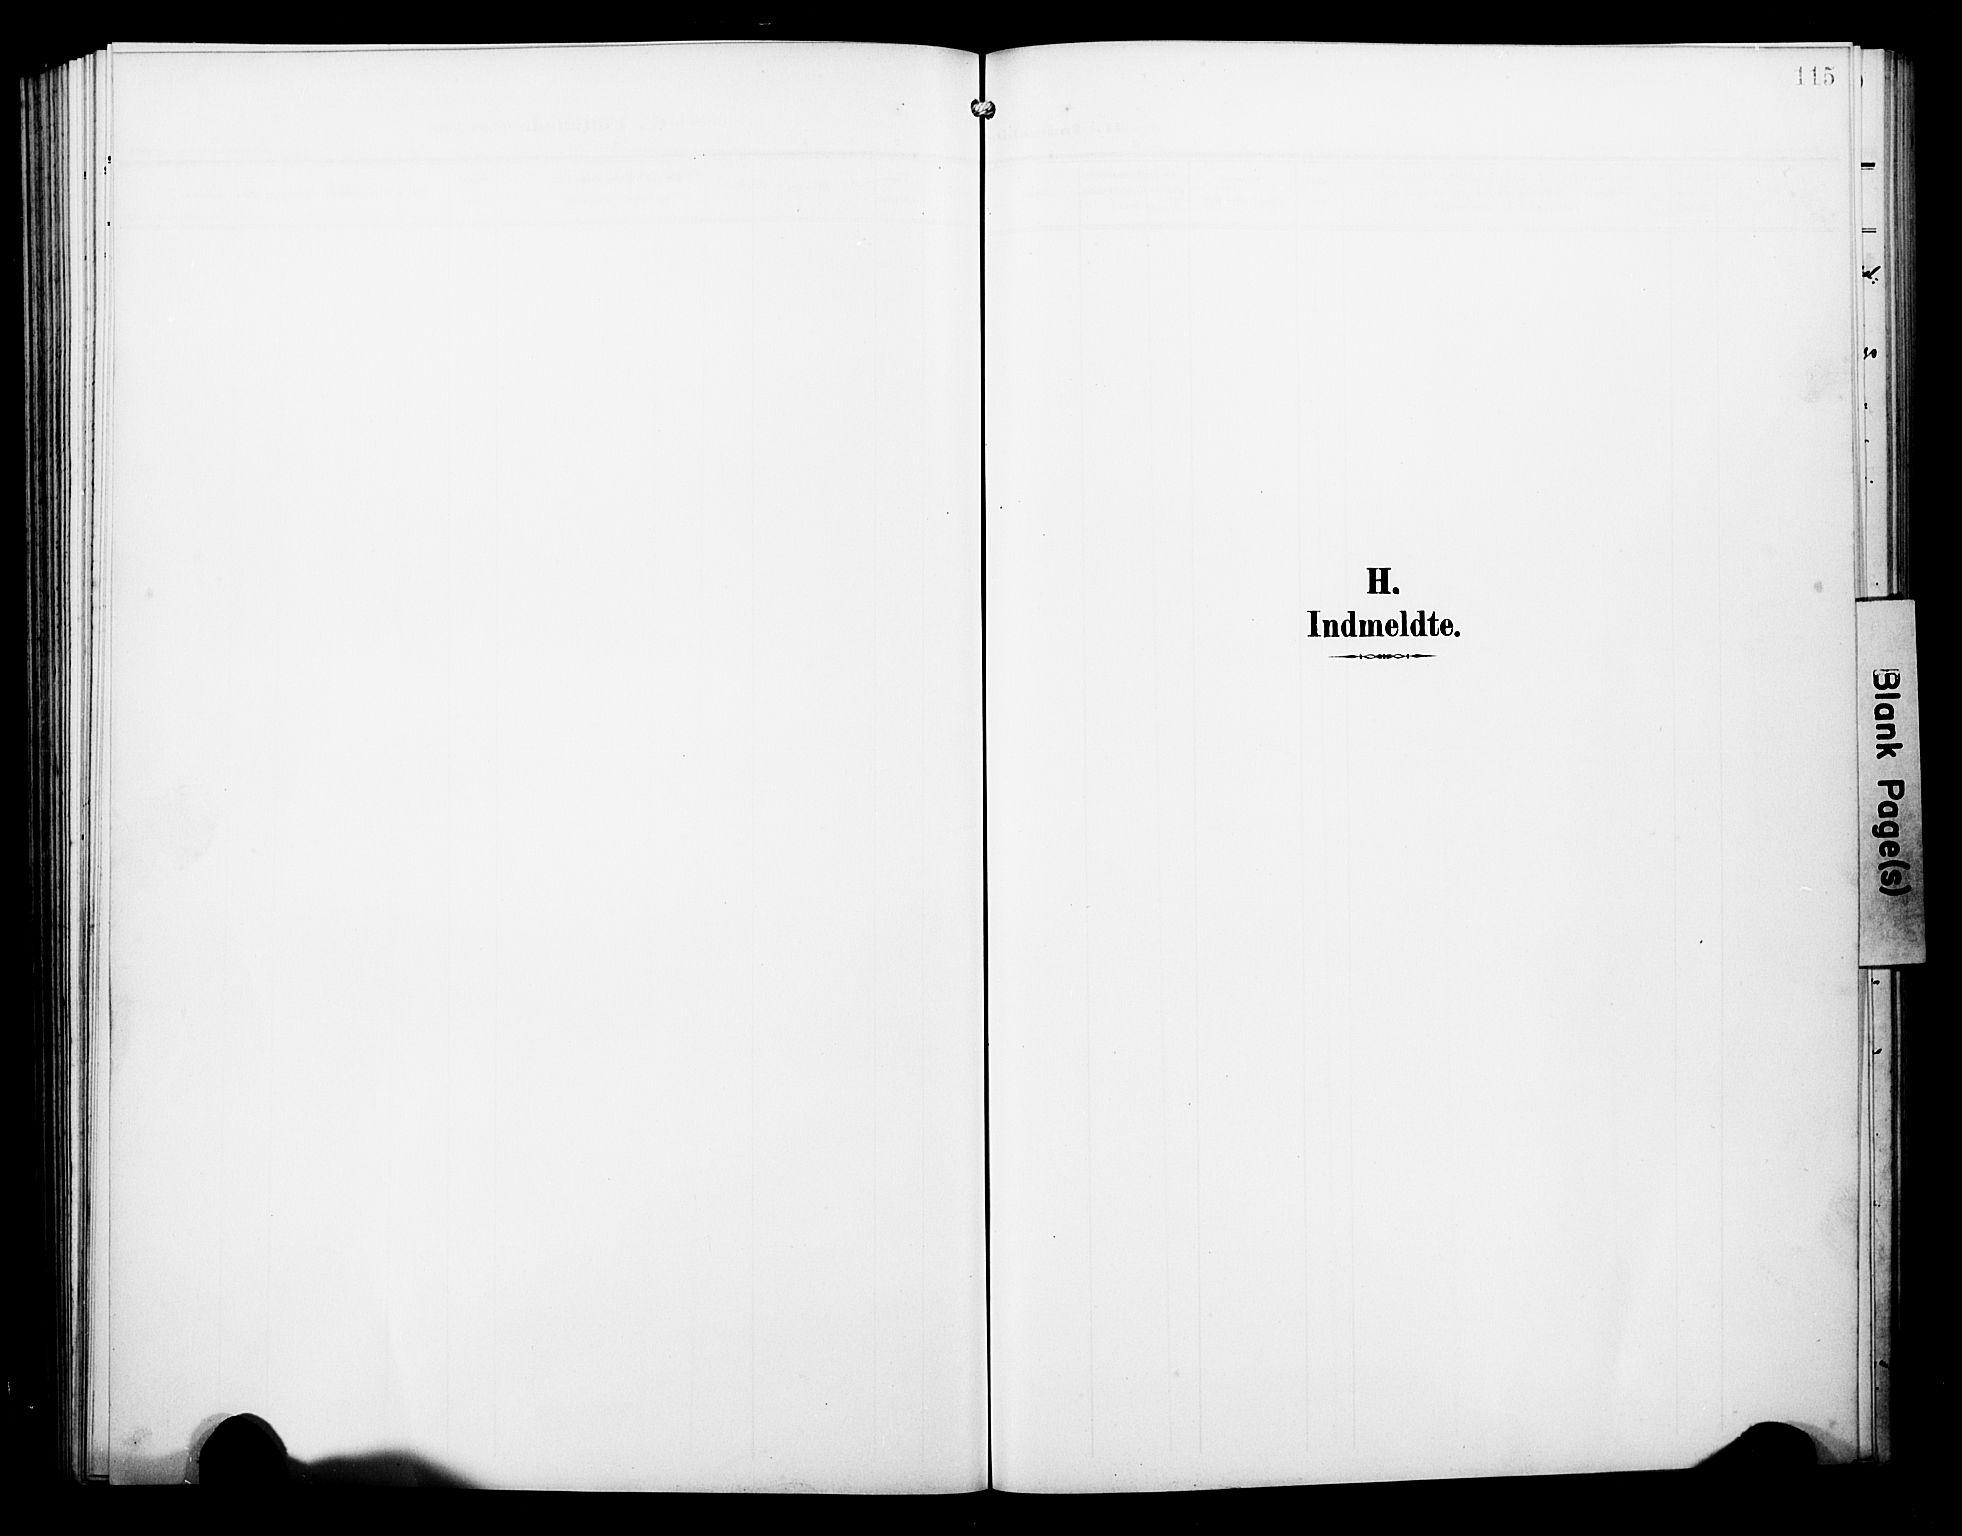 SAB, Arkivreferanse mangler*, Ministerialbok nr. A 1, 1907-1928, s. 115